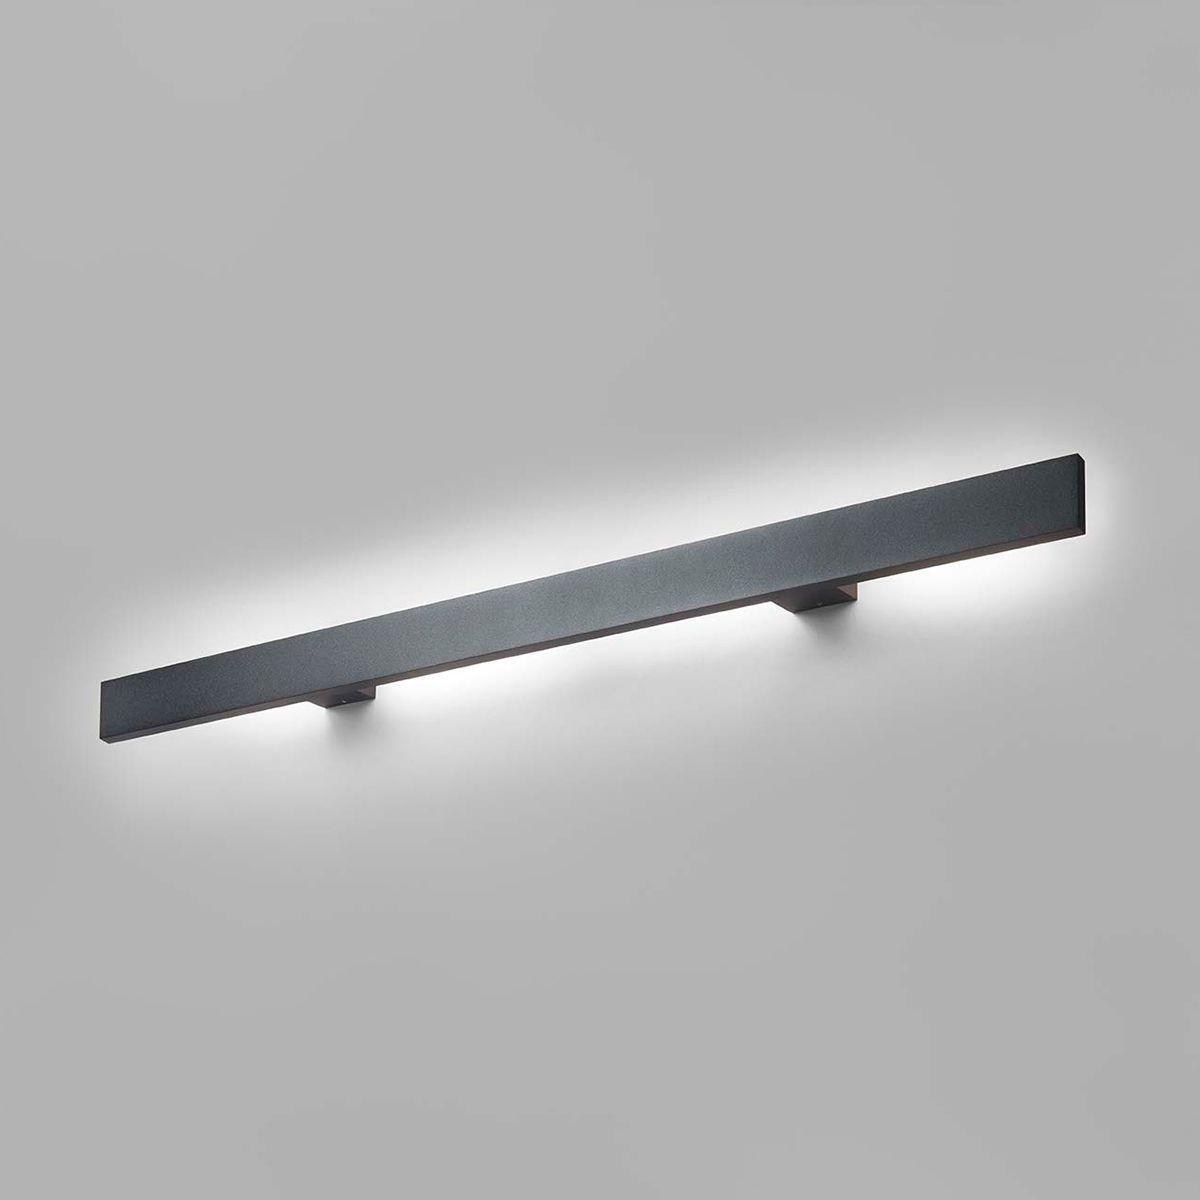 Contemporary wall light aluminum led linear stick by ronni contemporary wall light aluminum led linear stick by ronni gol audiocablefo